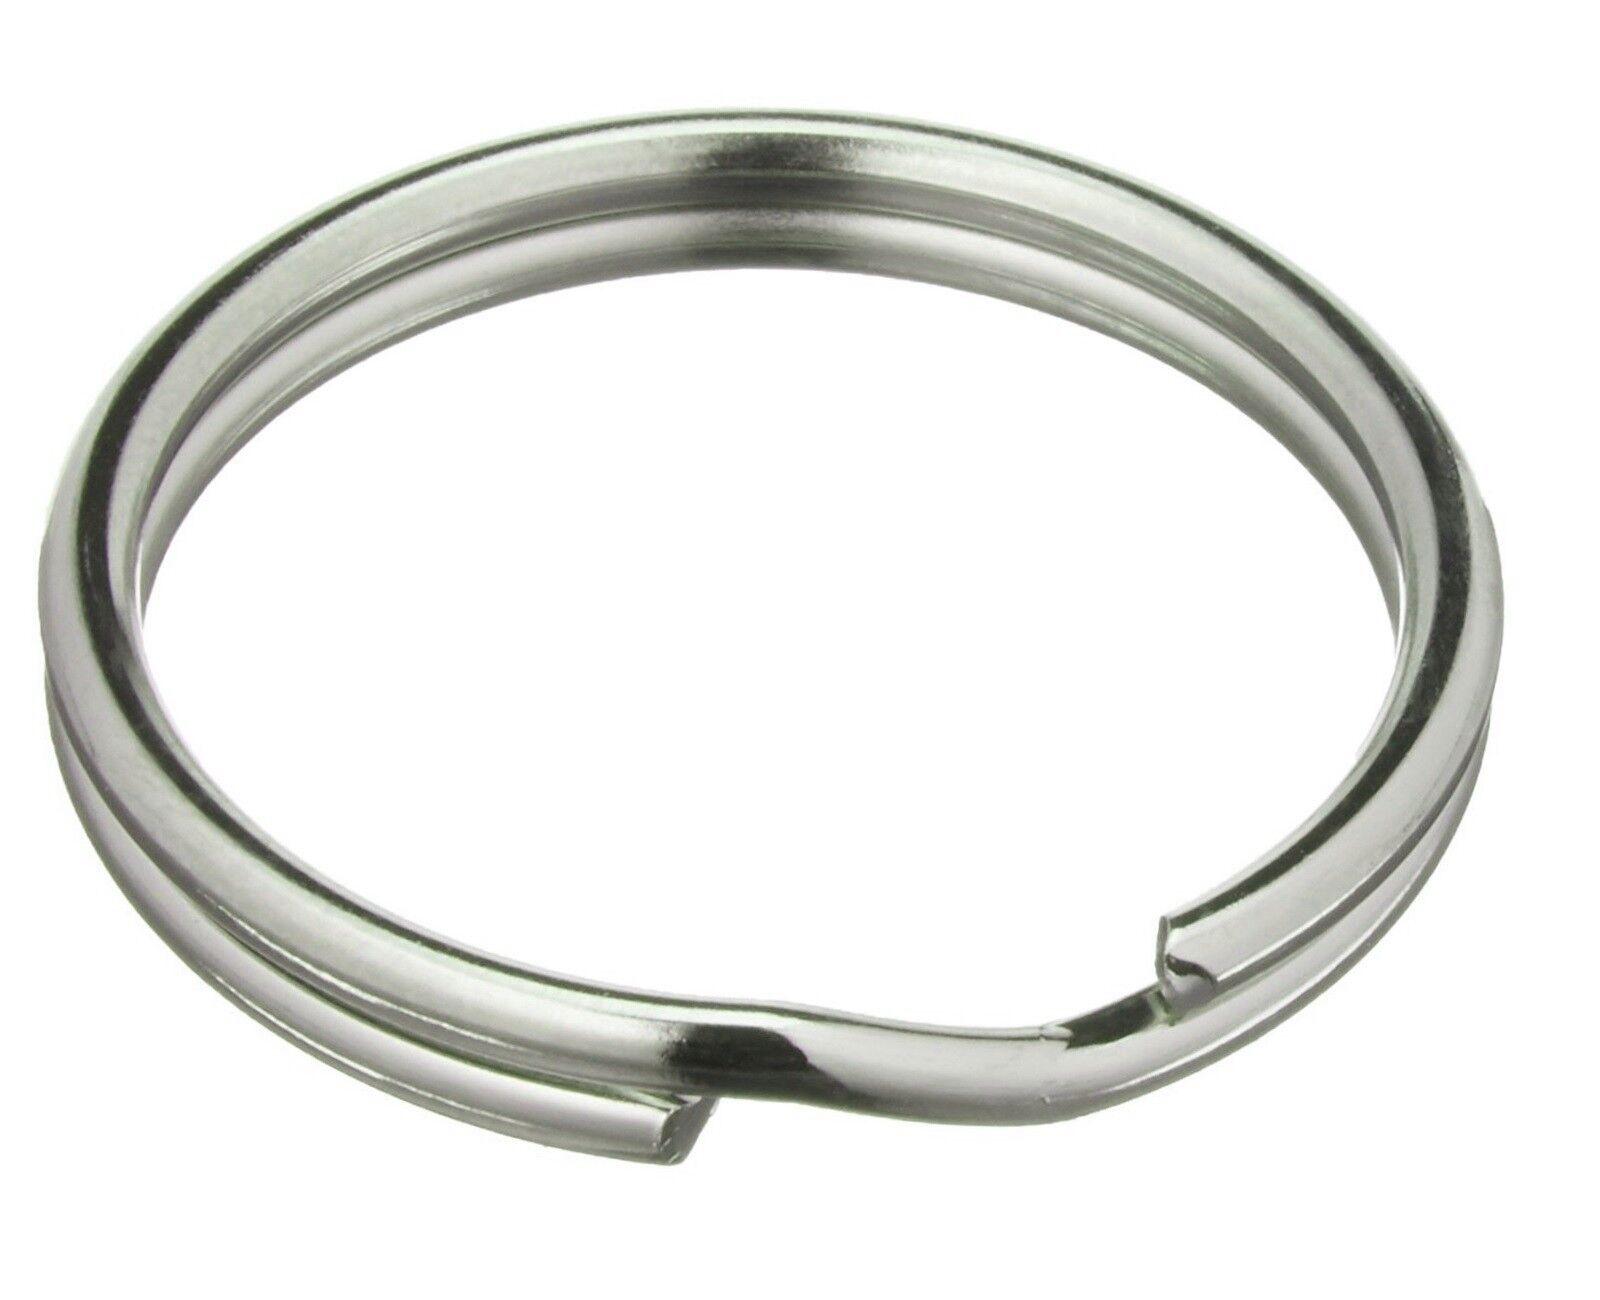 100 Schlüsselringe 25mm FLACH Schlüsselring Design Stahlring Edelstahl Anhänger